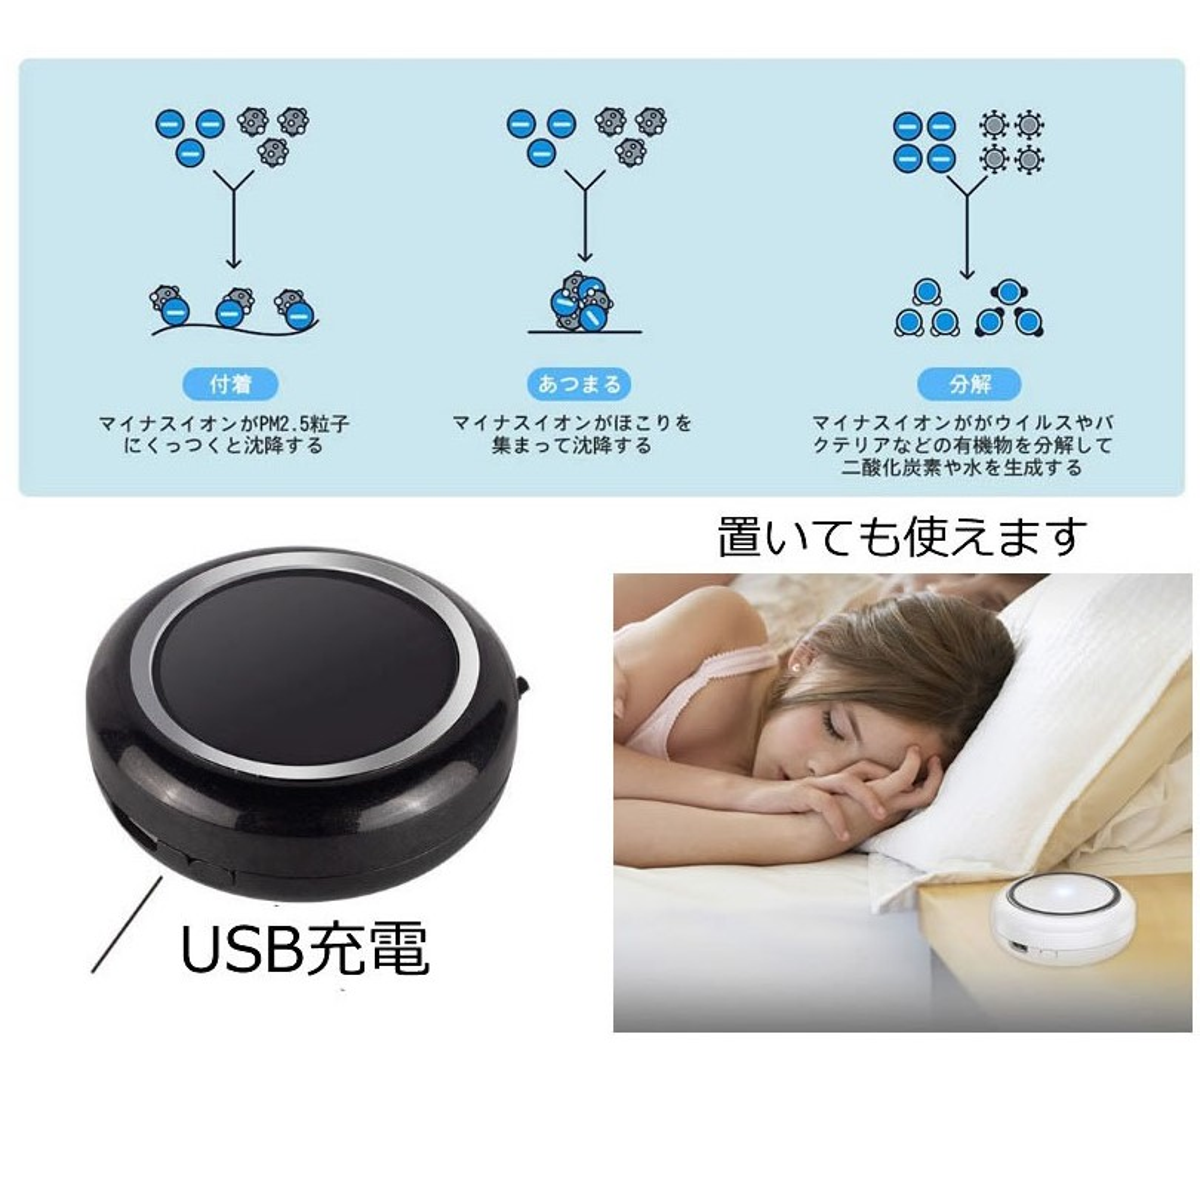 USB充電 20時間連続稼働 付属のUSBケーブルをパソコンやスマホ充電器に接続して充電できます。充電時間は約30分間、フル充電後約20時間連続使用できます。